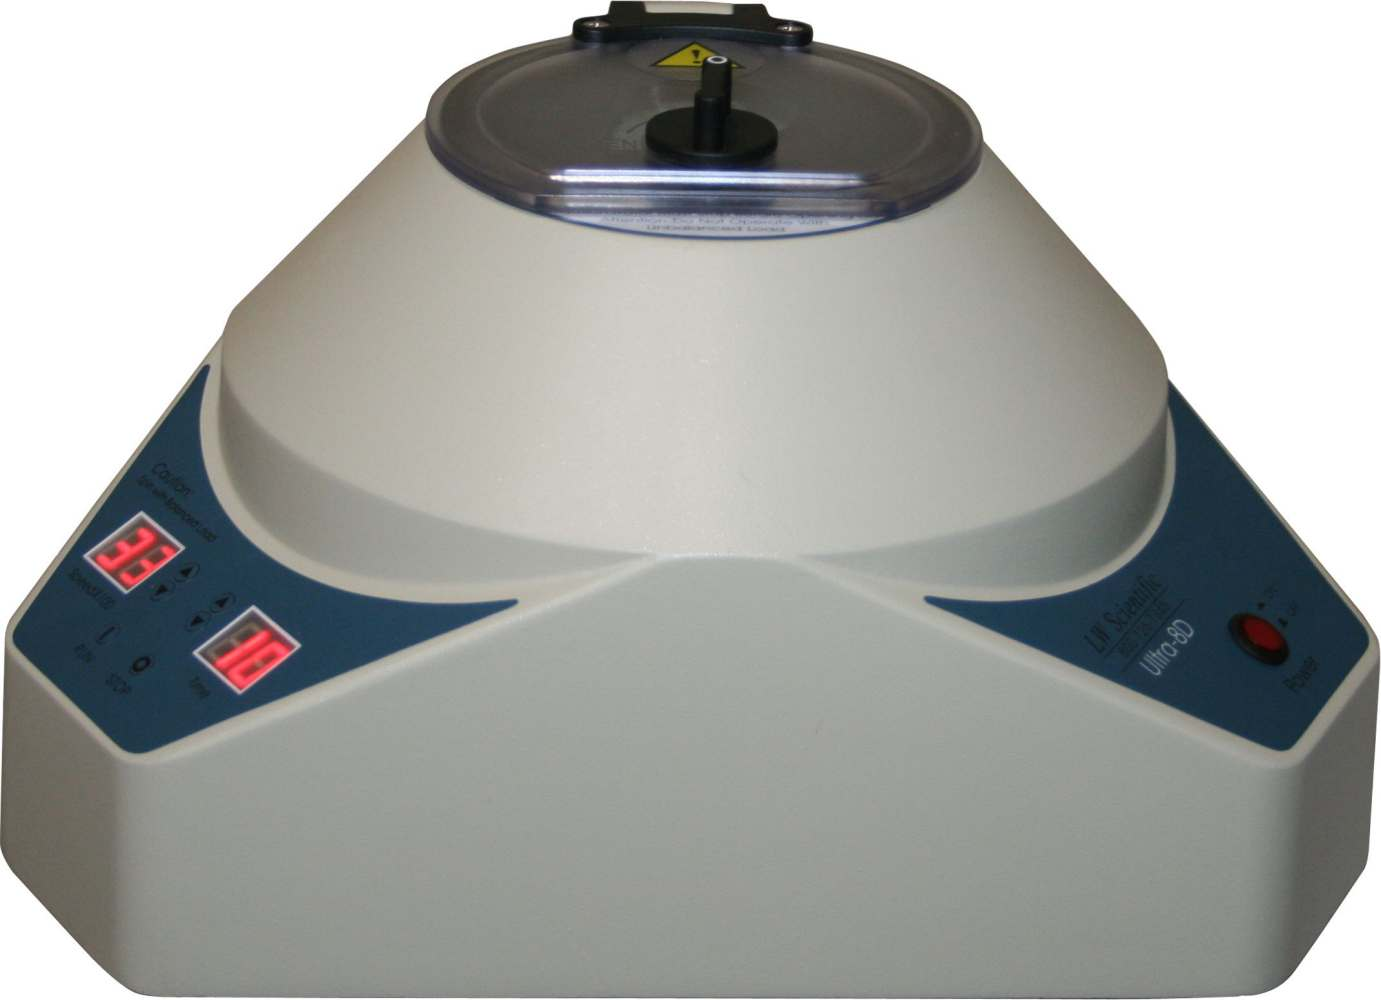 Lw scientific ultra 8v centrifuge